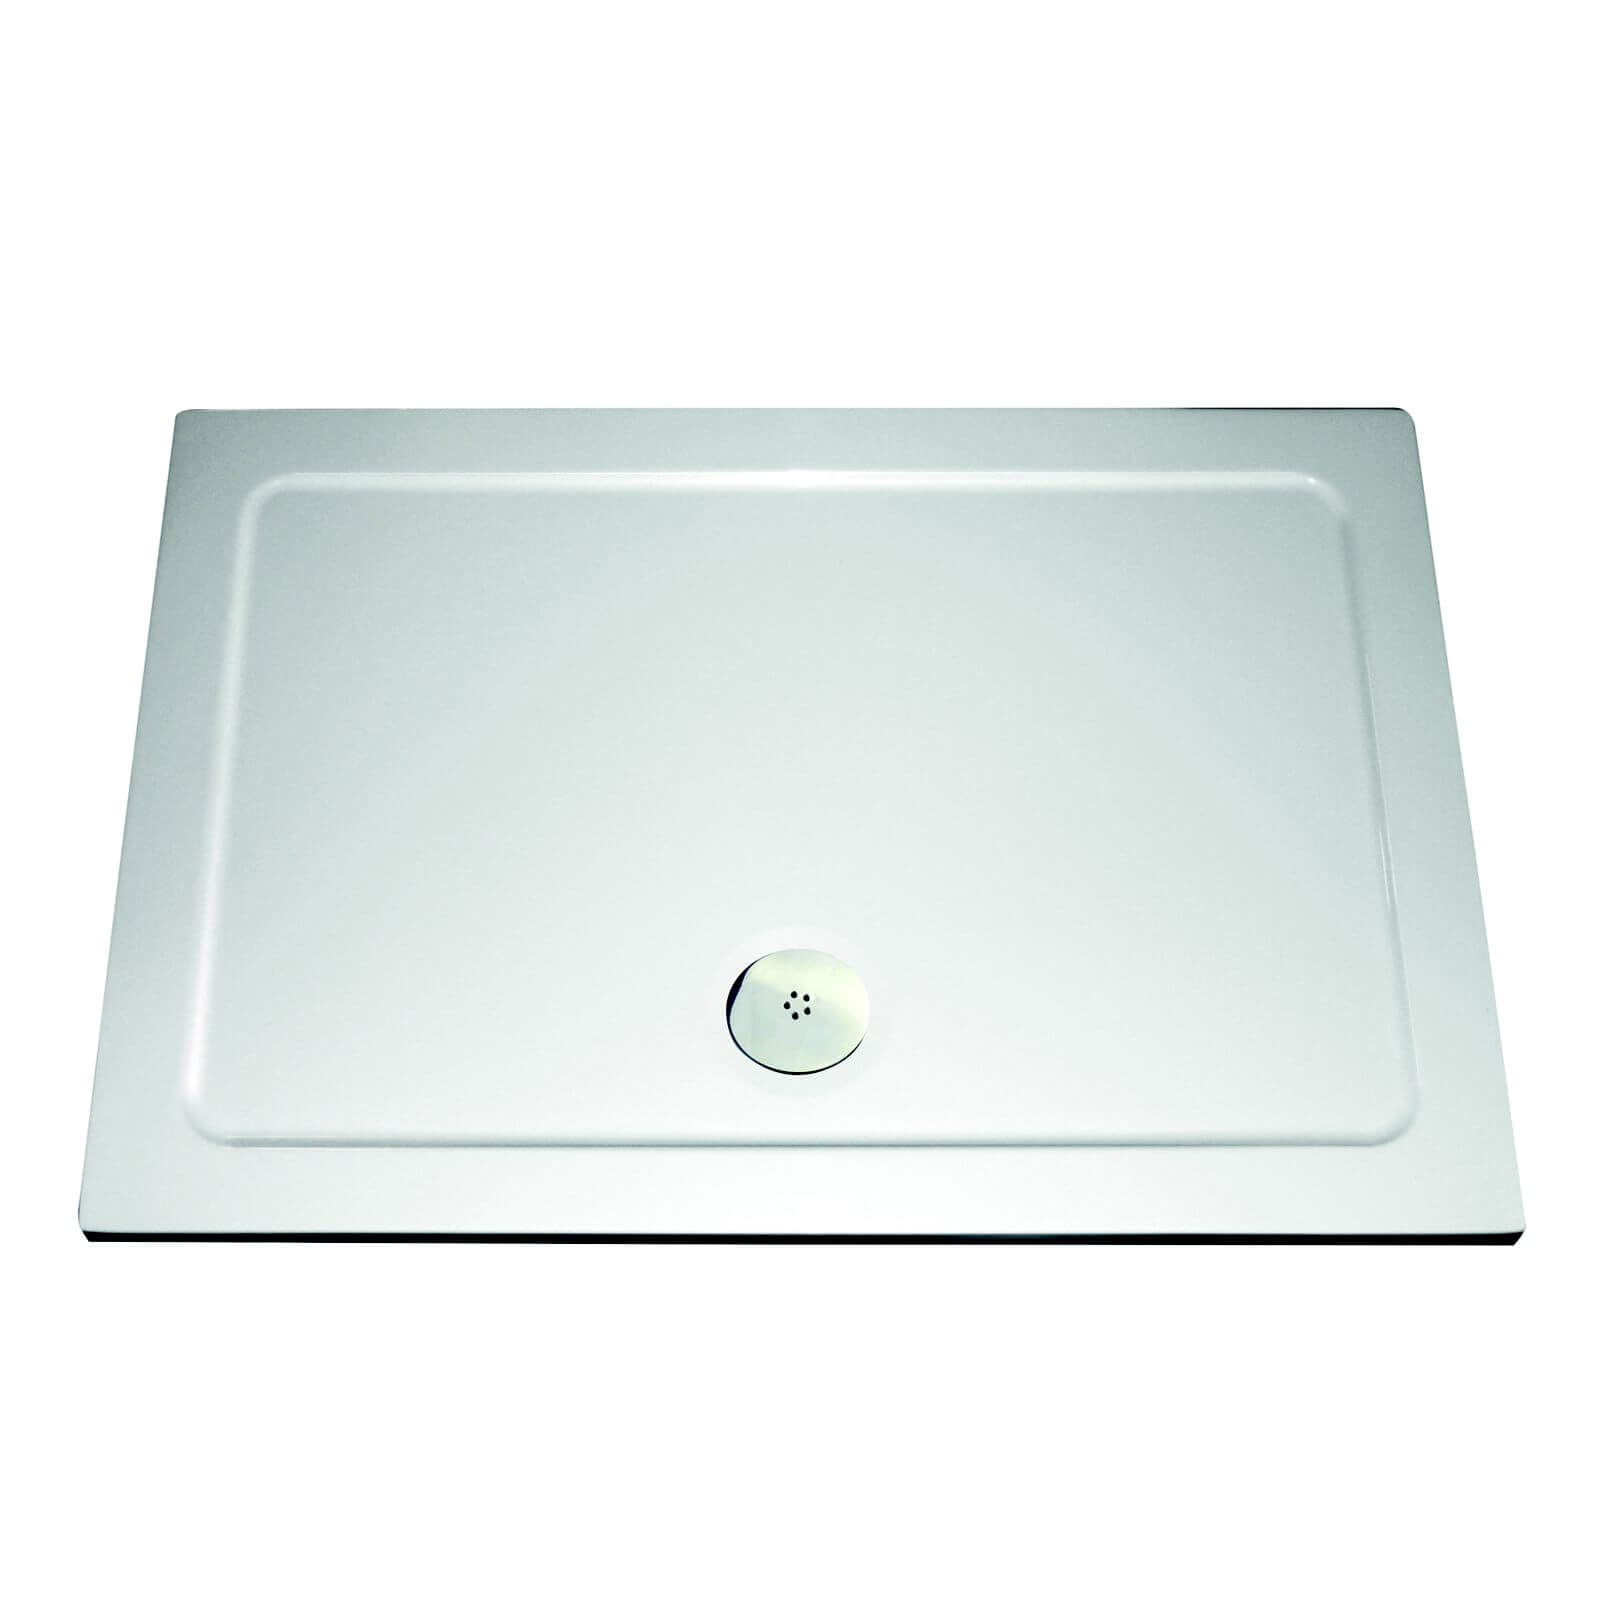 Aqualux Rectangular Shower Tray - 1400 x 900 x 35mm